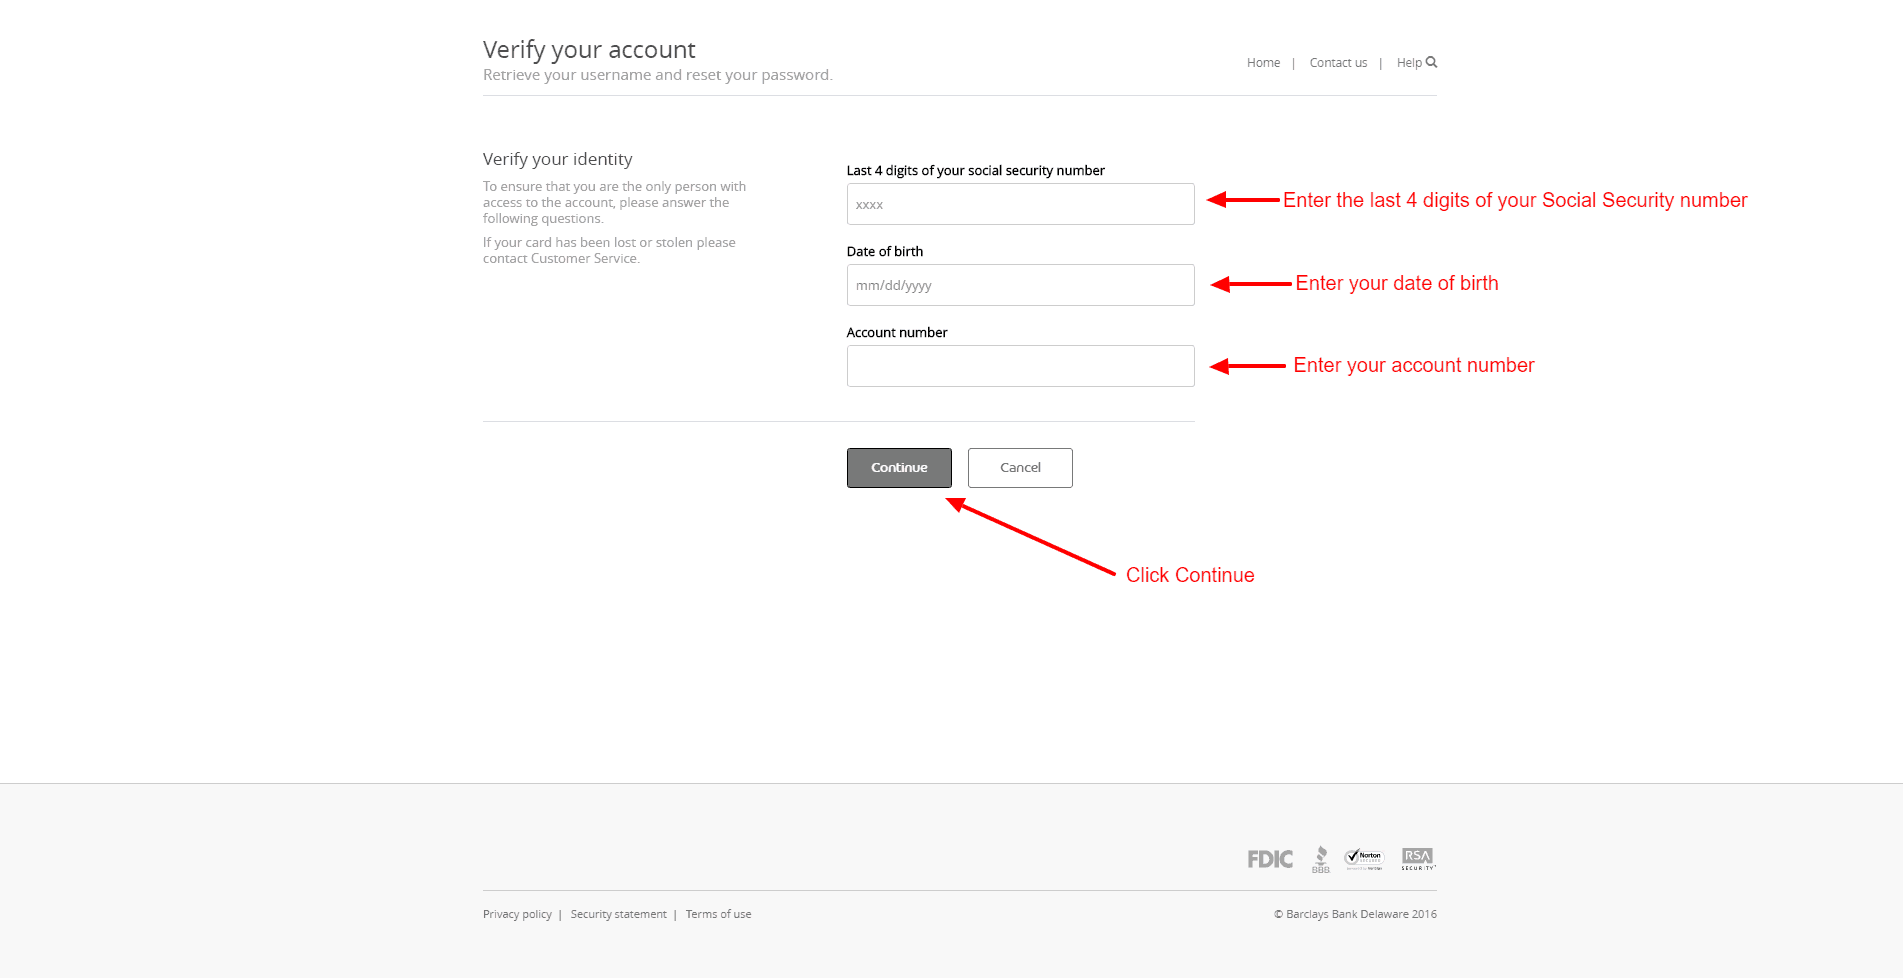 03_luxury-card_resetpassword_04